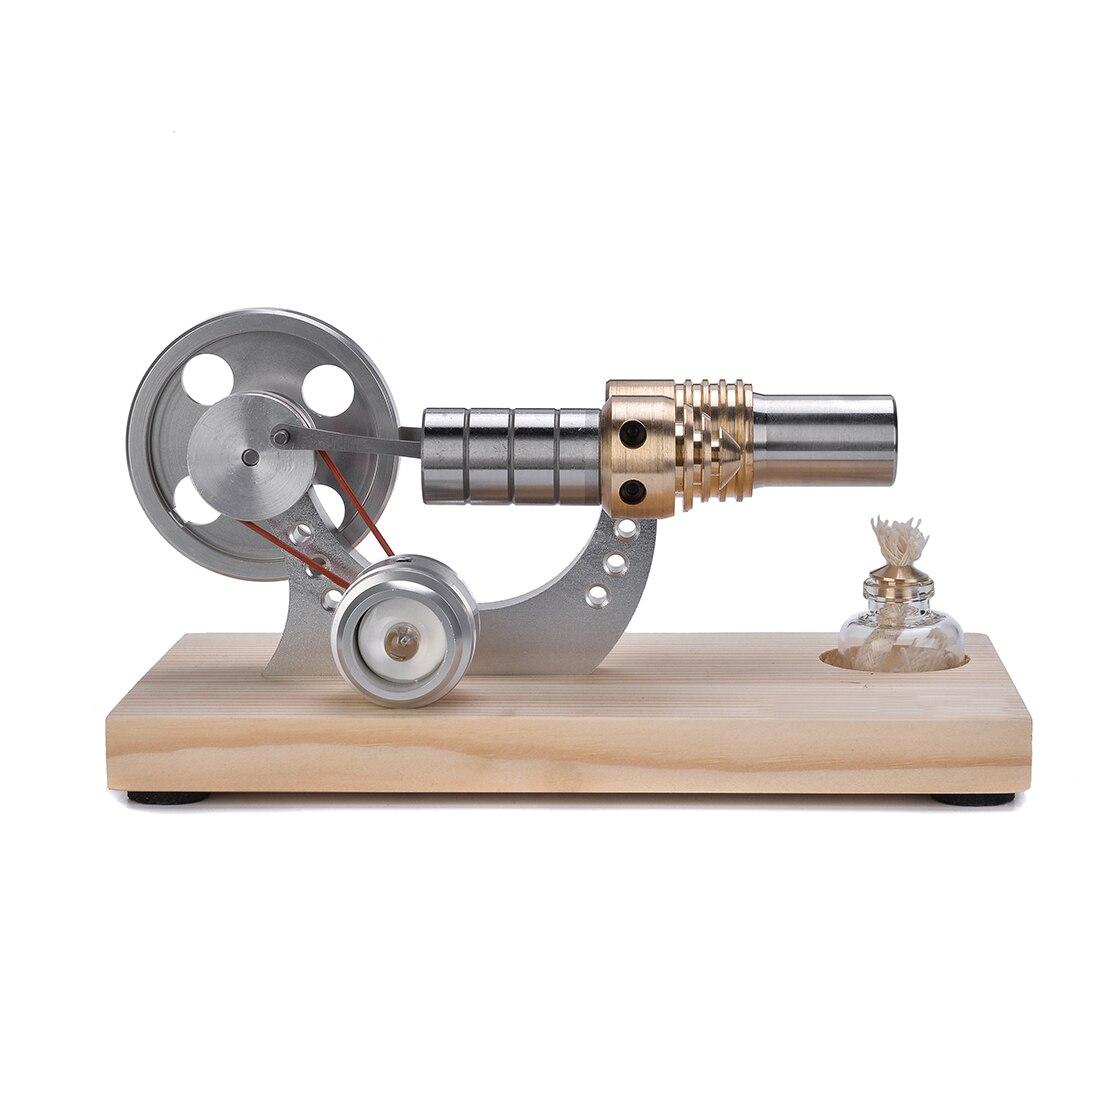 NFSTRIKE Metal Cylinder Bootable Stirling Engine Model Micro External Combustion Engine Model Building Kits Educational Learning